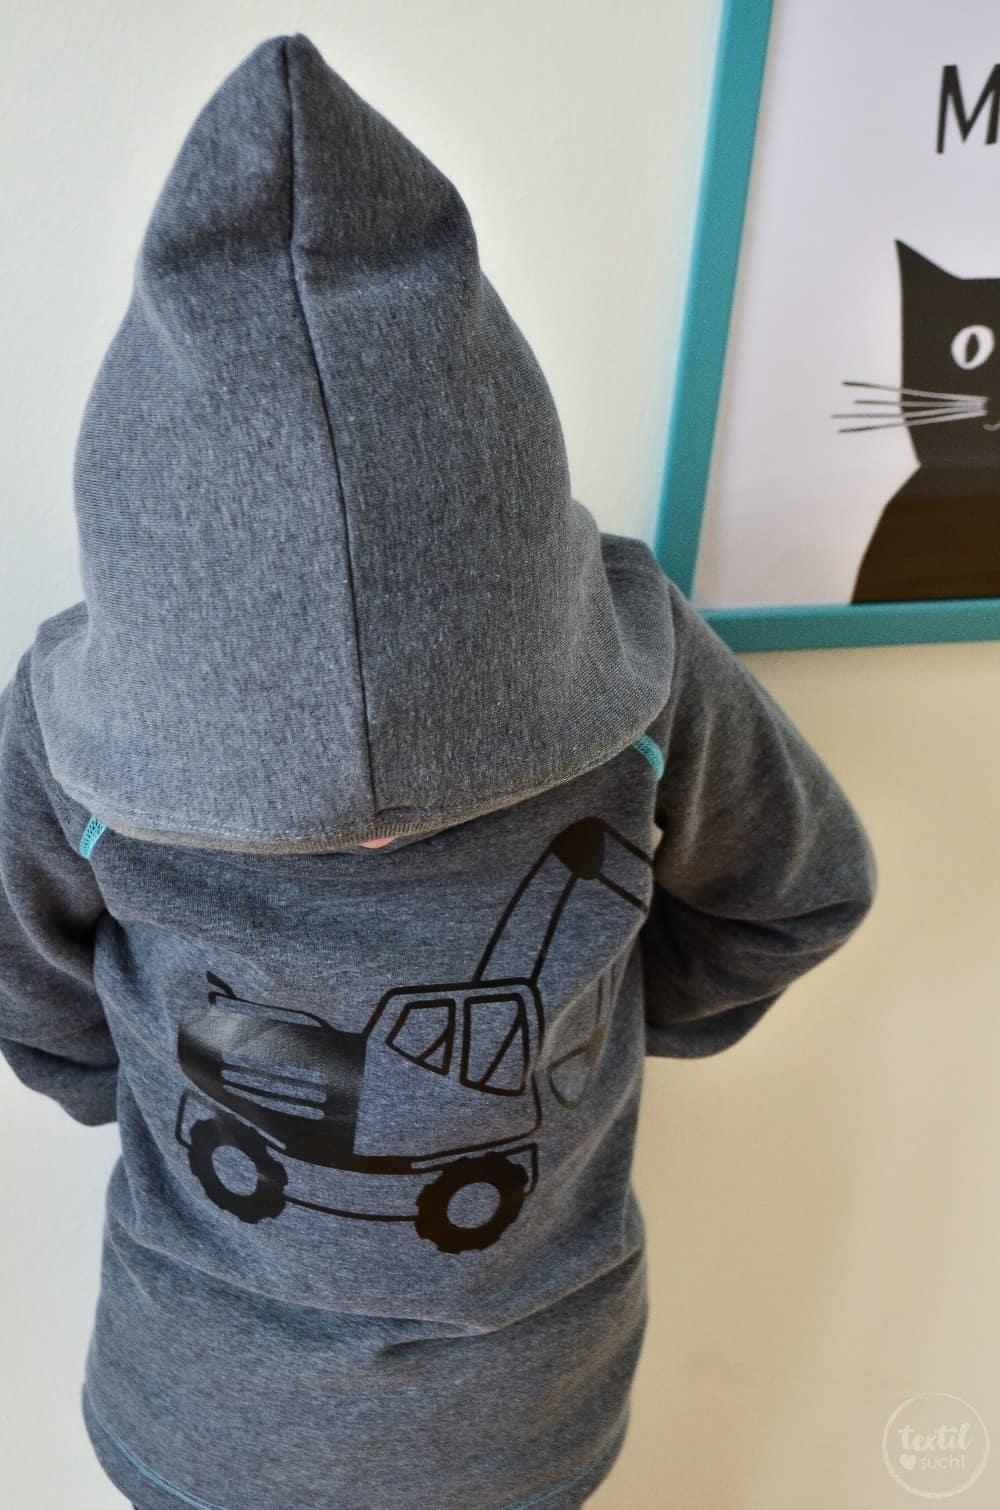 Kapuzenpullover nähen: Raglansweater Max und Maxi - Bild 2 | textilsucht.de